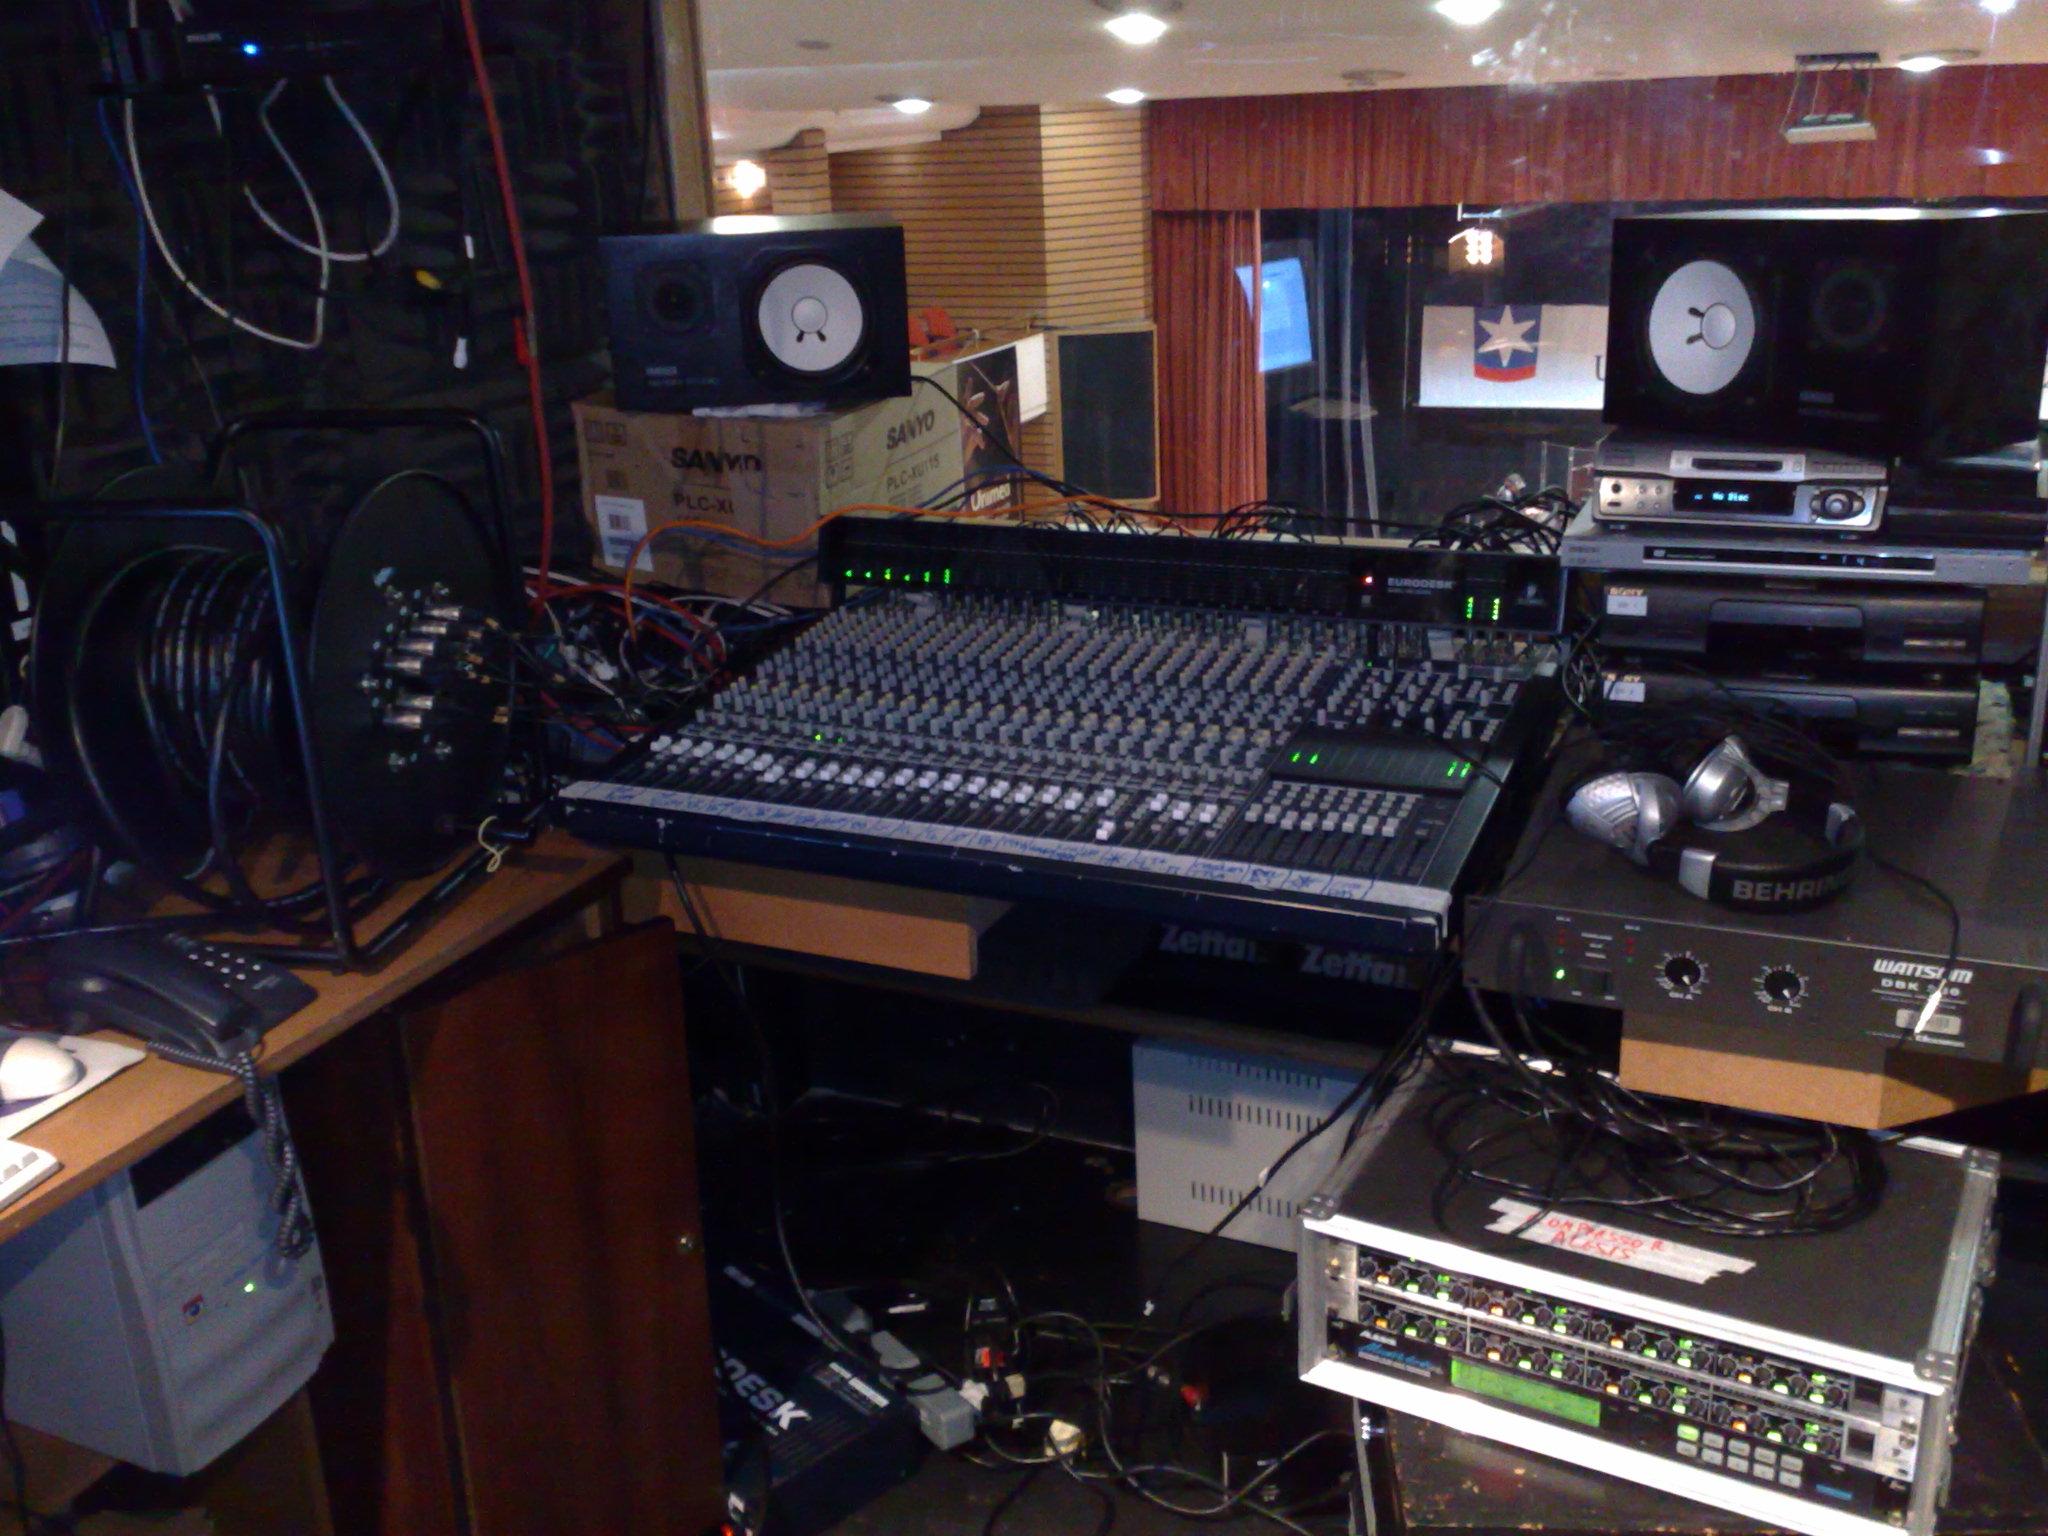 filetheater sound design behringer mx8000 yamaha ns10m